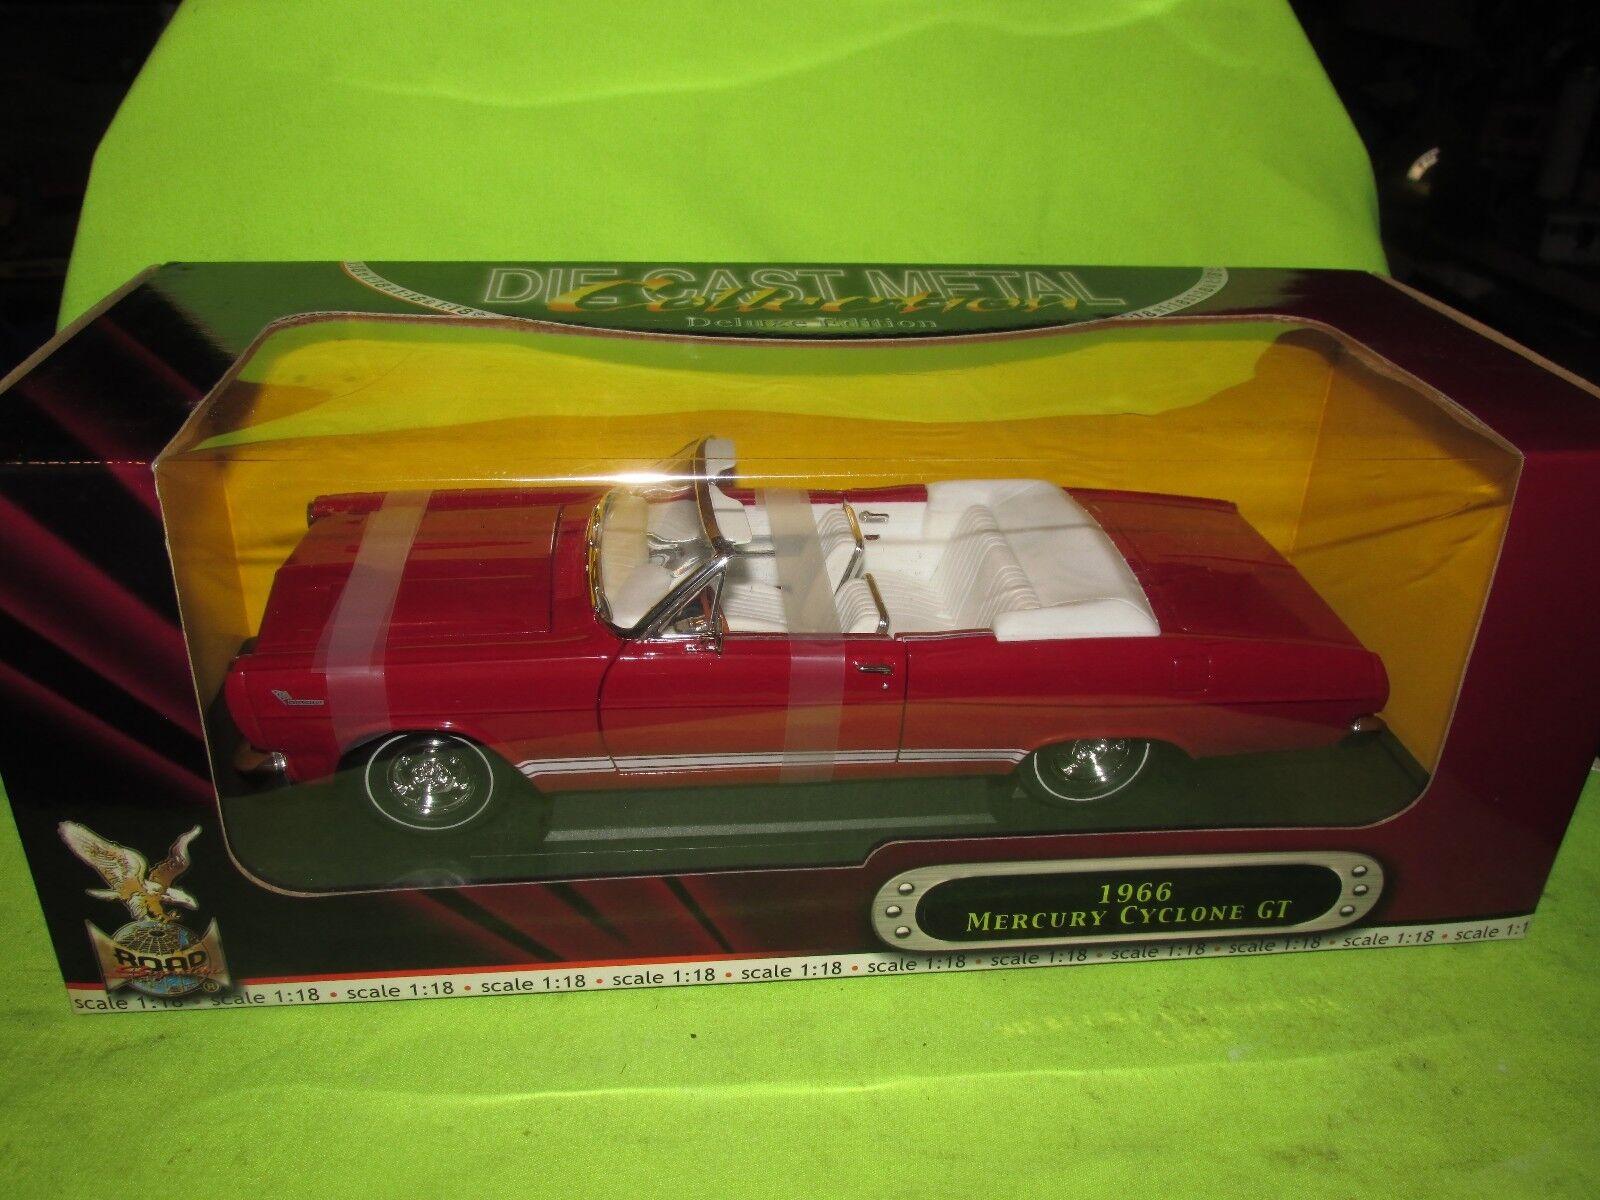 66 Zyklon Gt Mercury 1964 1 18 Rot Yat Ming Road Signature Deluxe